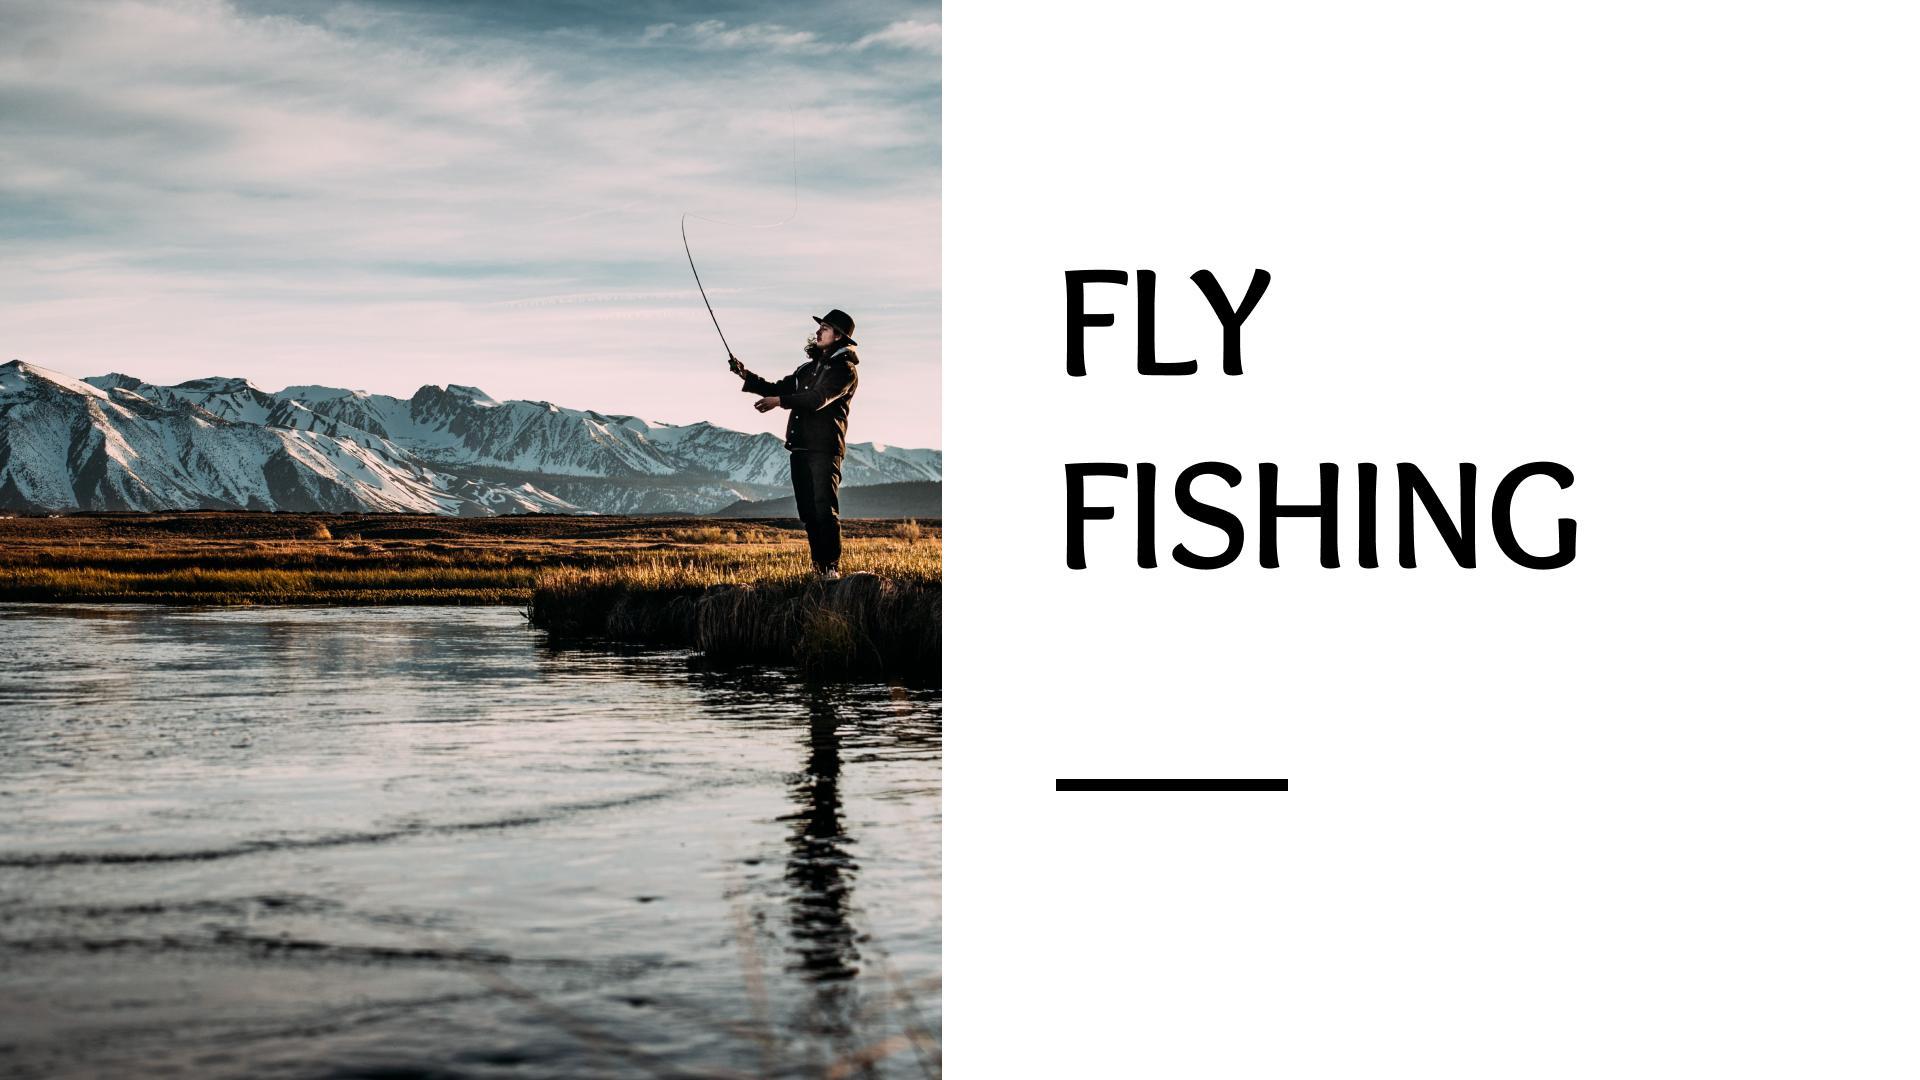 fly fishing: image